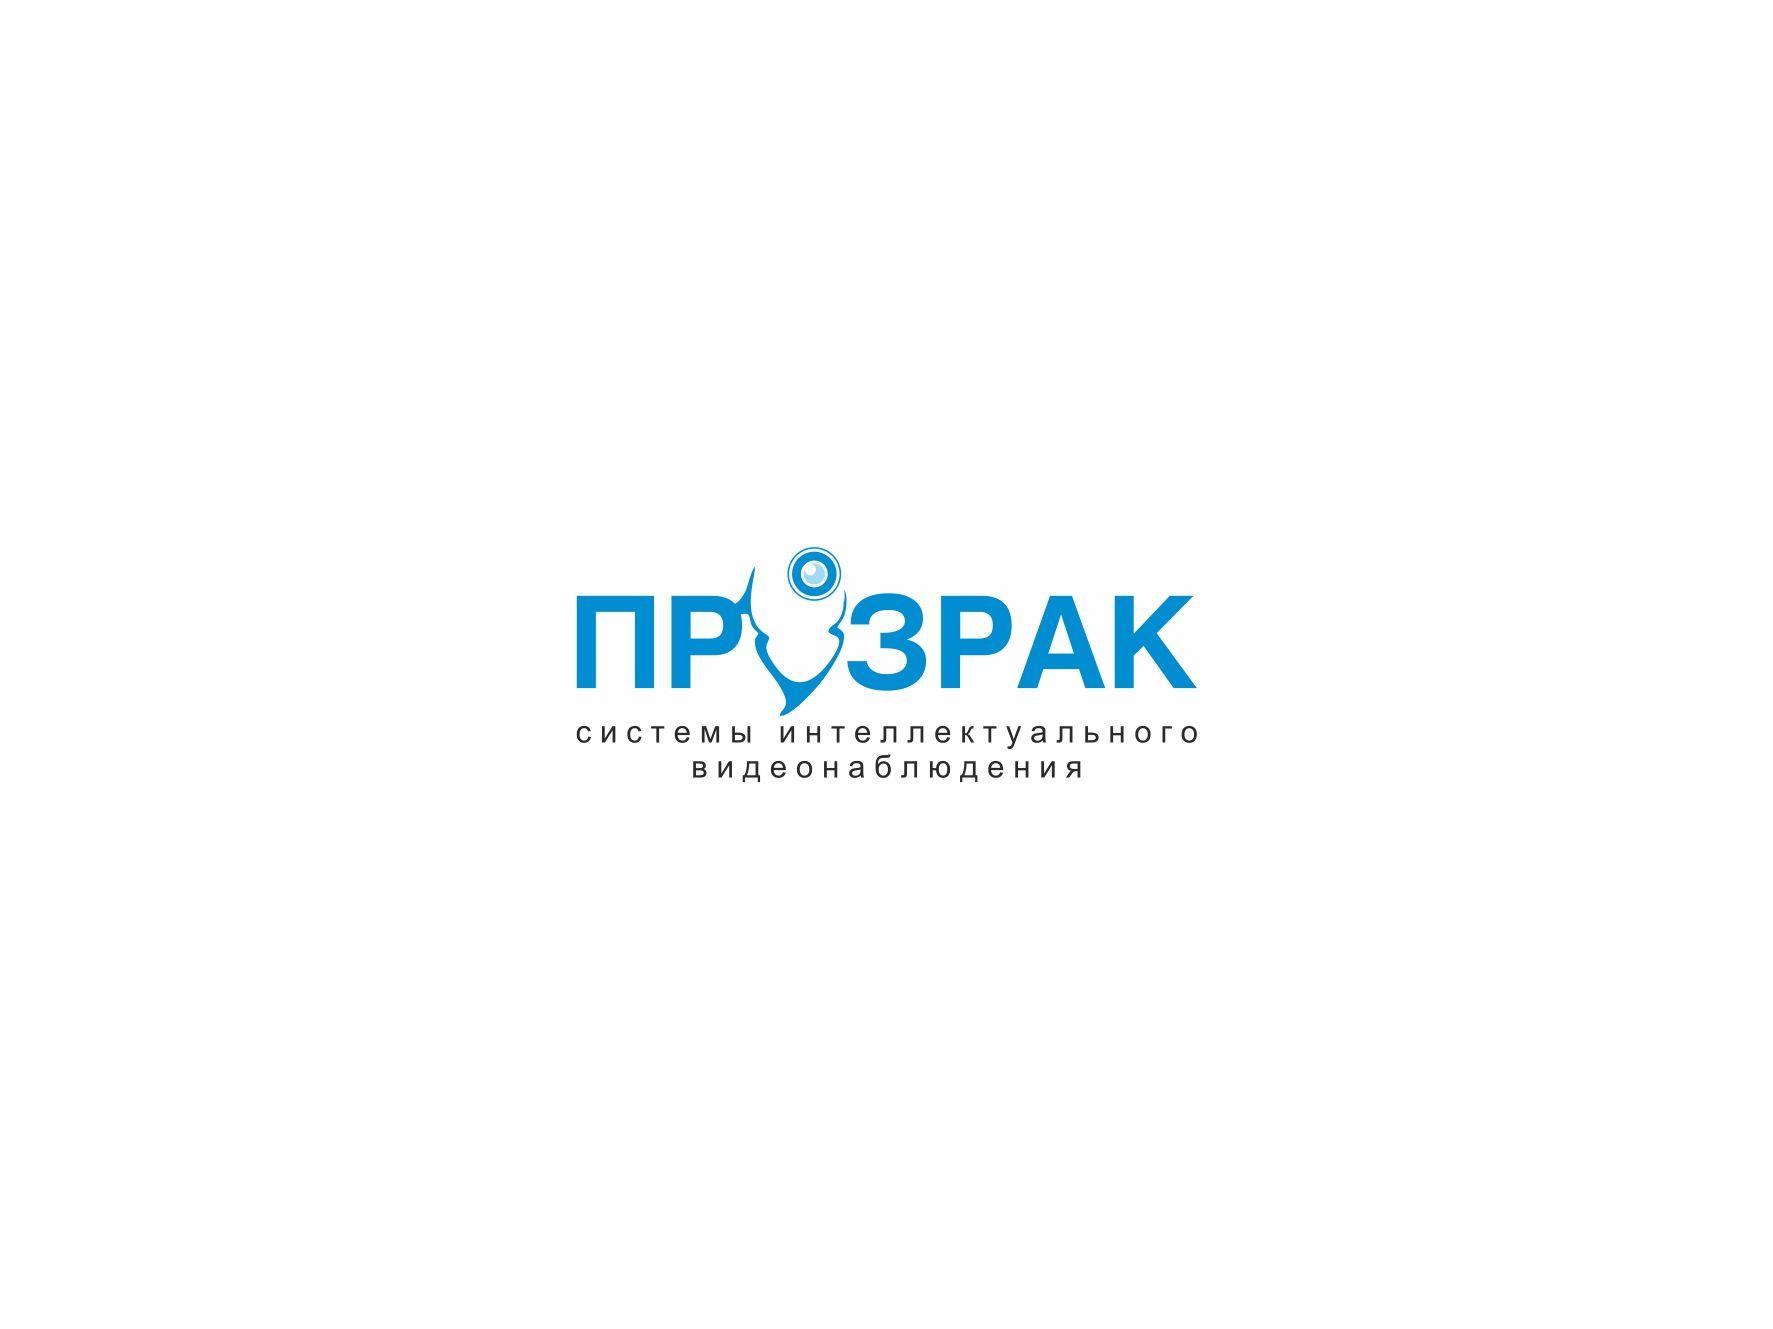 Разработка логотипа - дизайнер VictorBazine